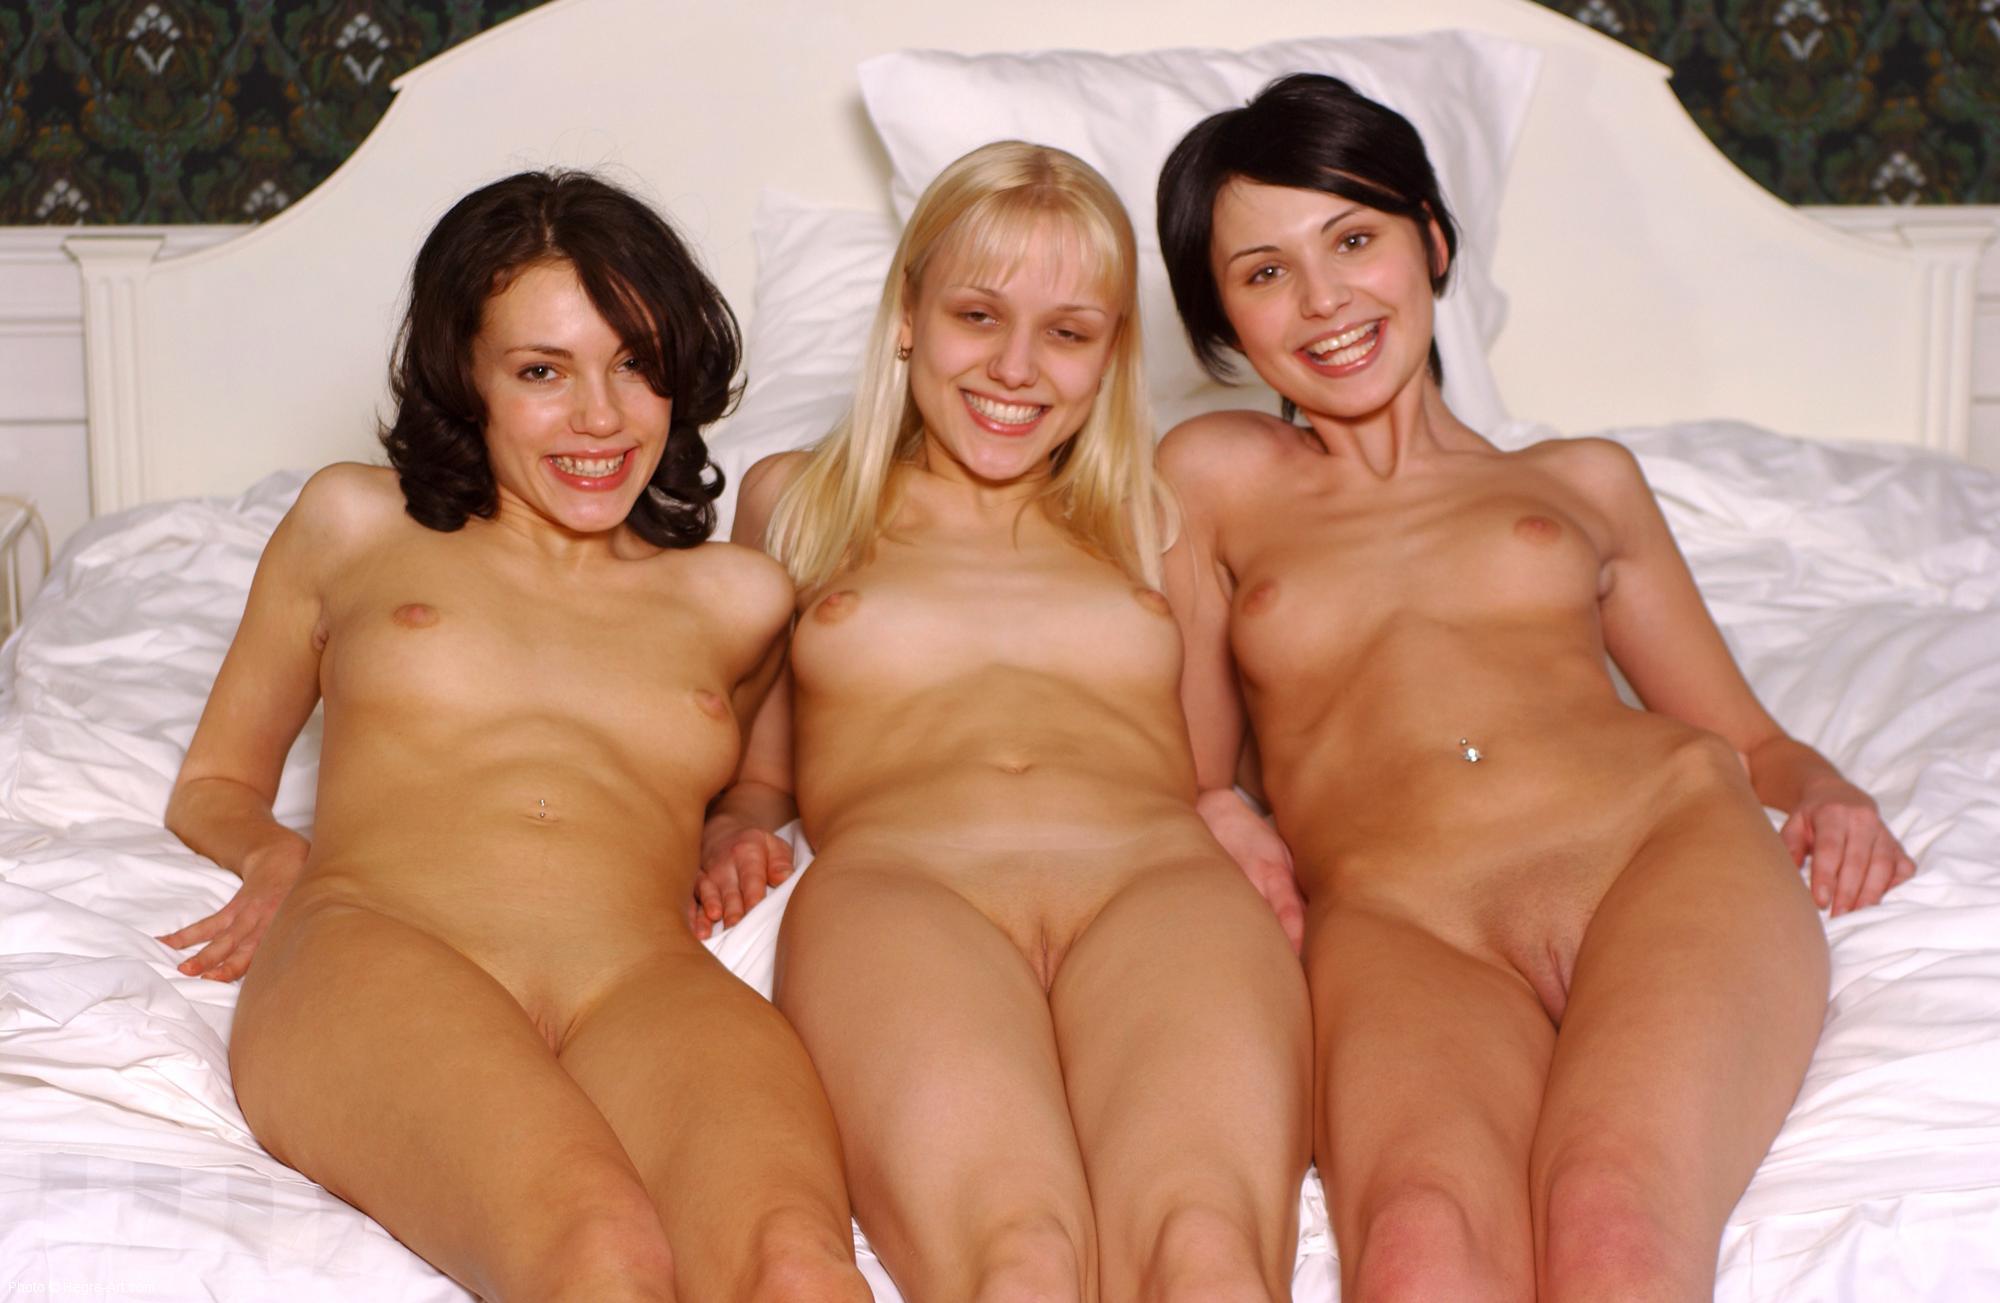 Три мамочки и один мужик 29 фотография